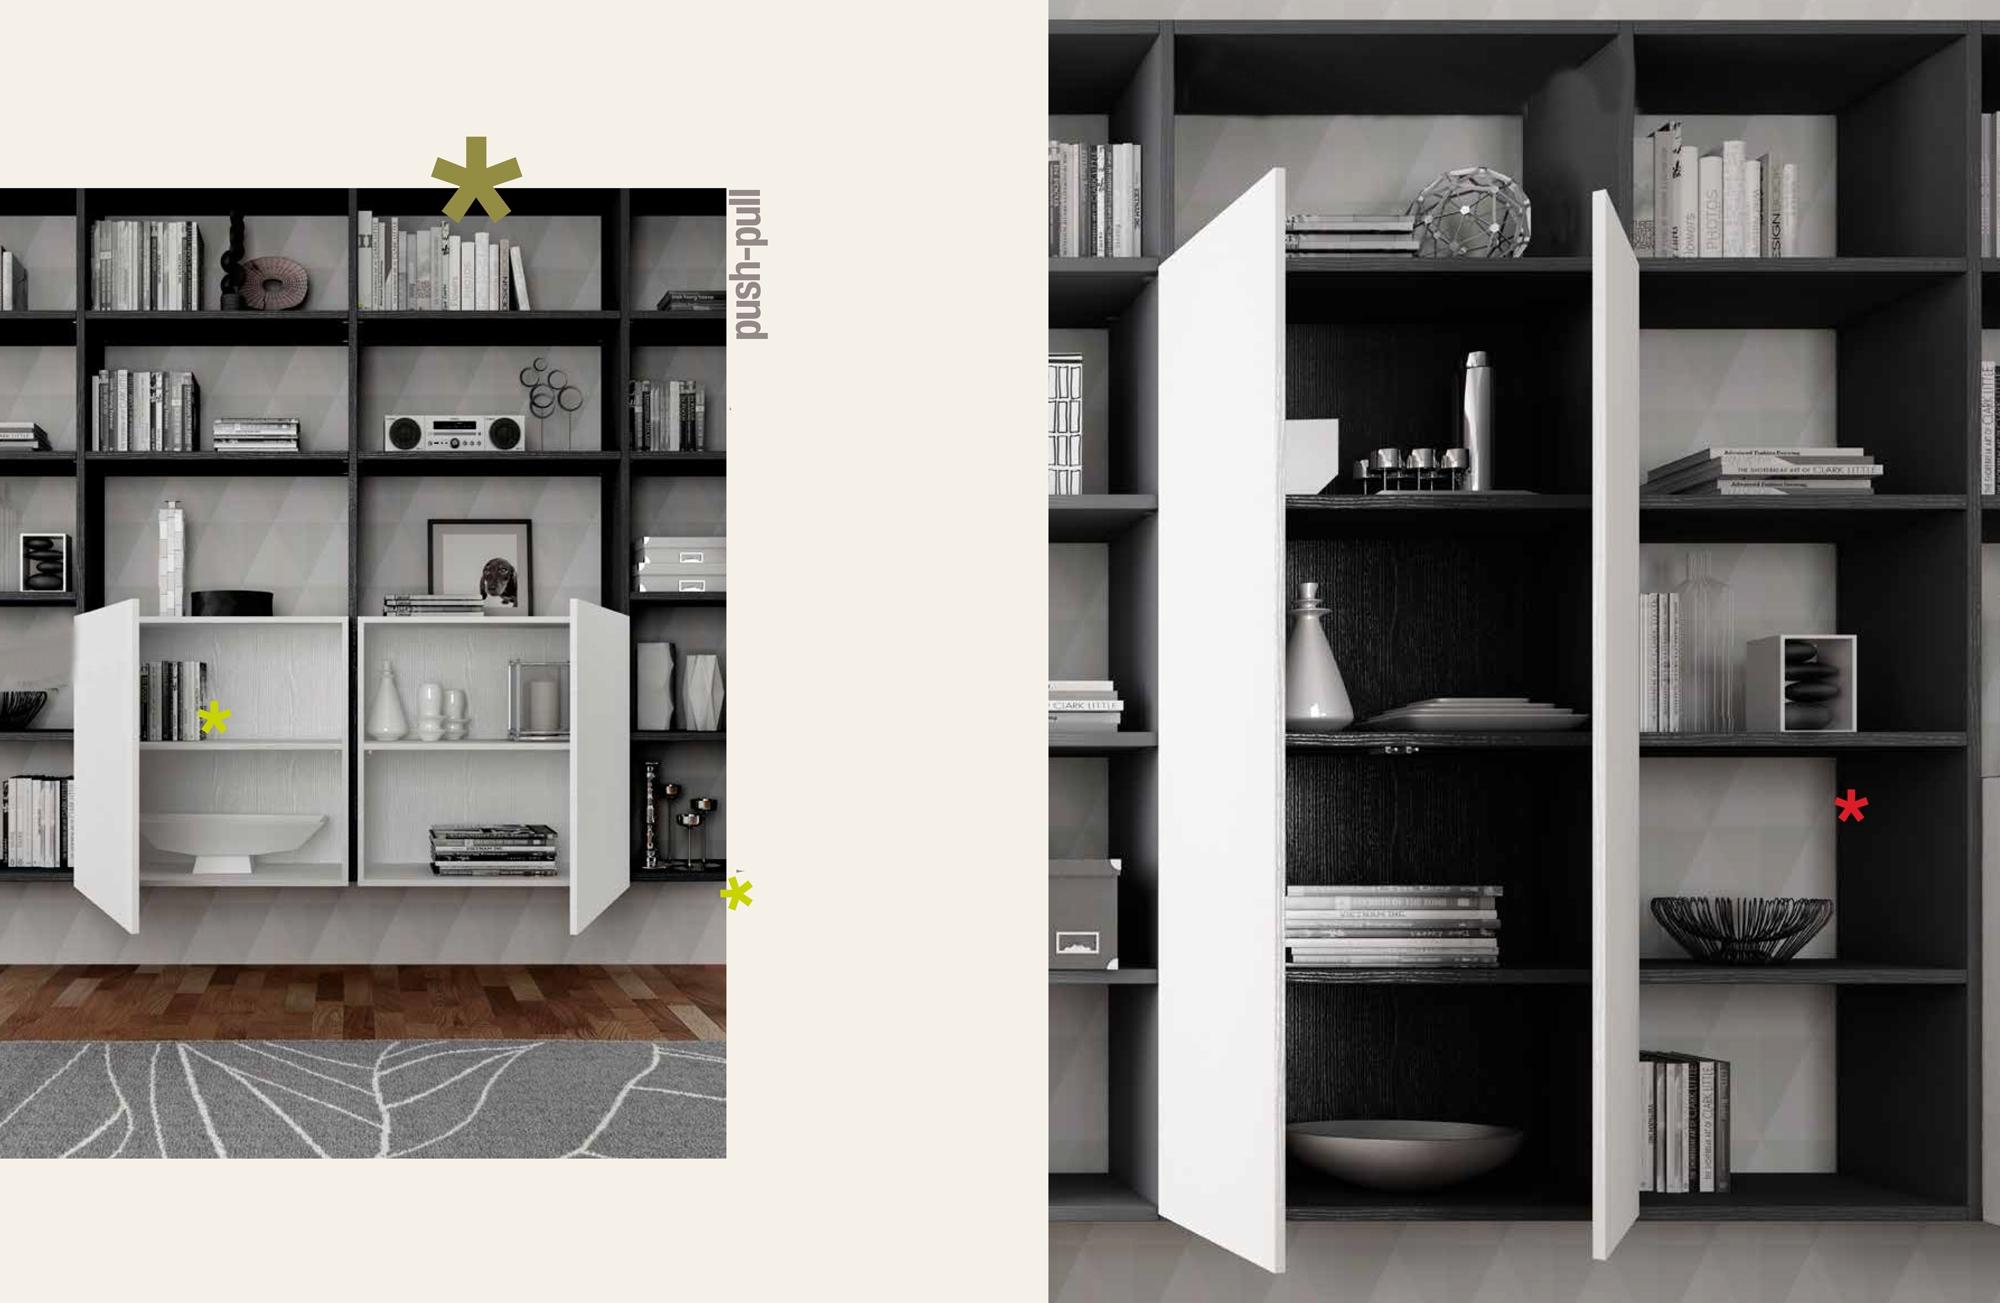 Biblioth Que Design Suspendue Unique Moretti Compact So Nuit # Bibliotheque Suspendue Pour Chambre